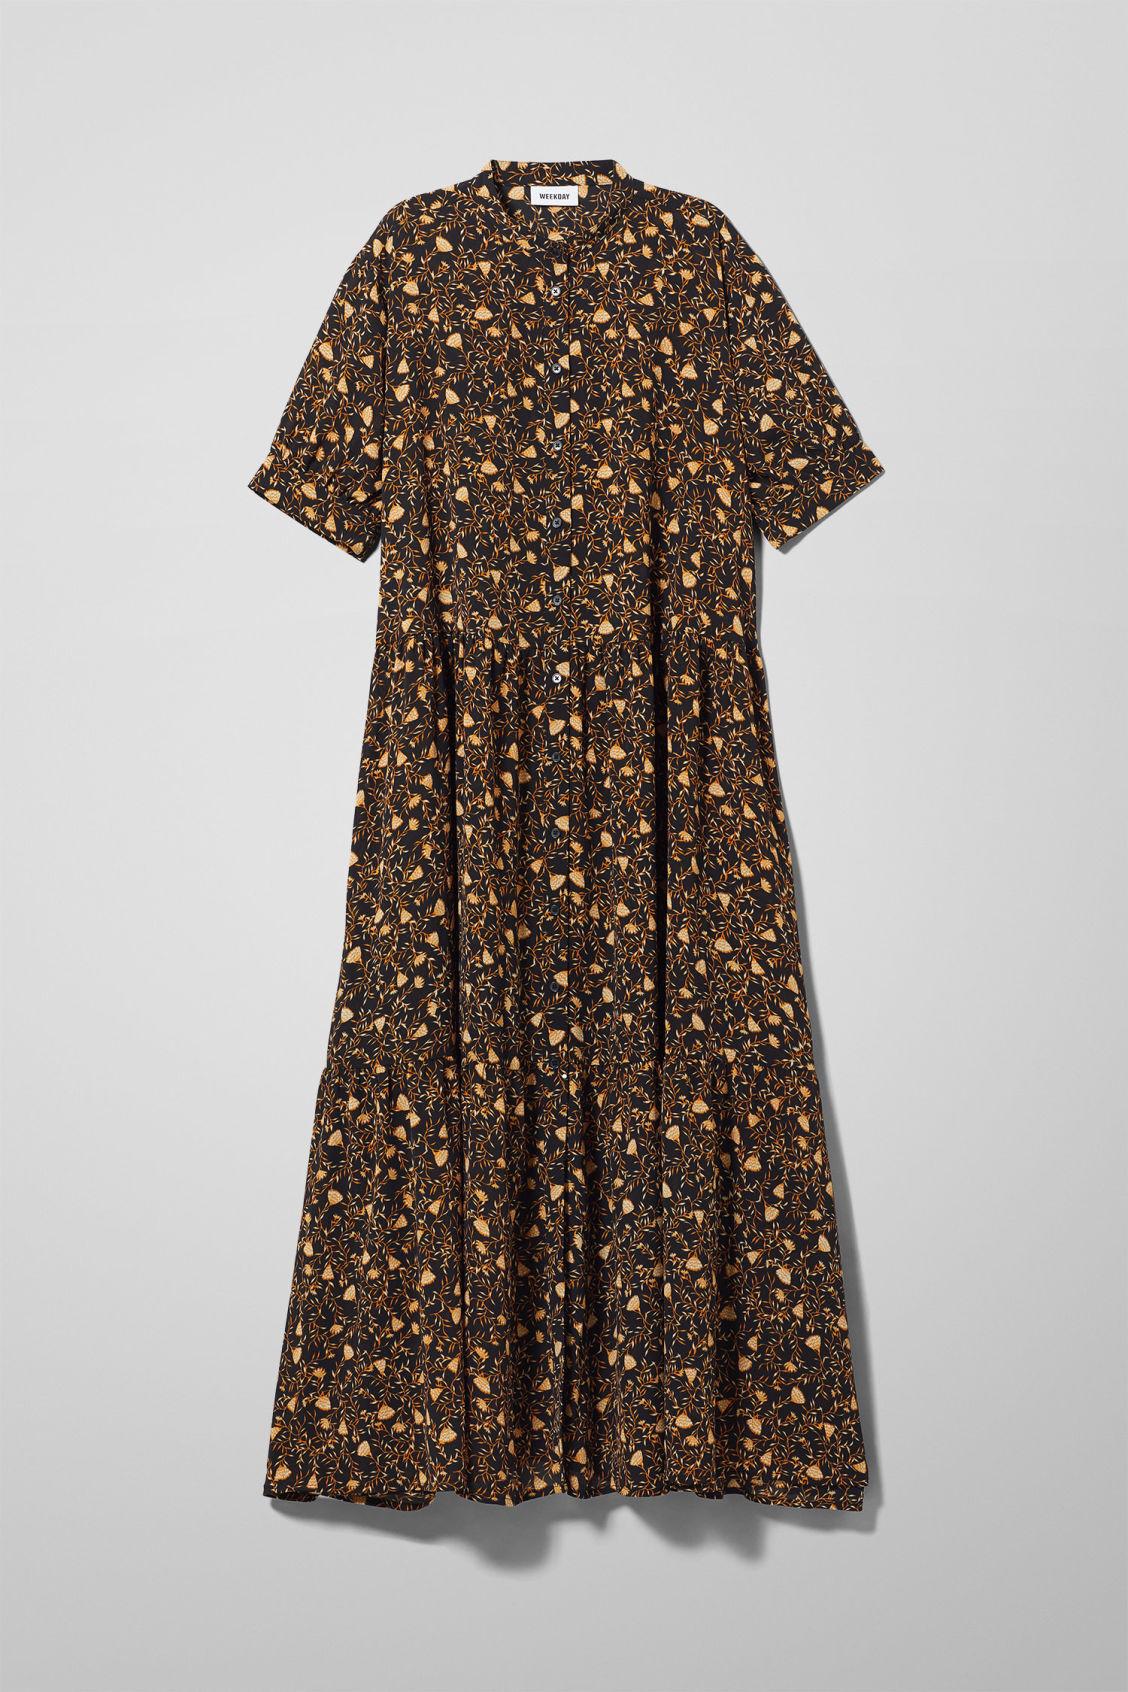 Image of Storm Dress - Black-XS